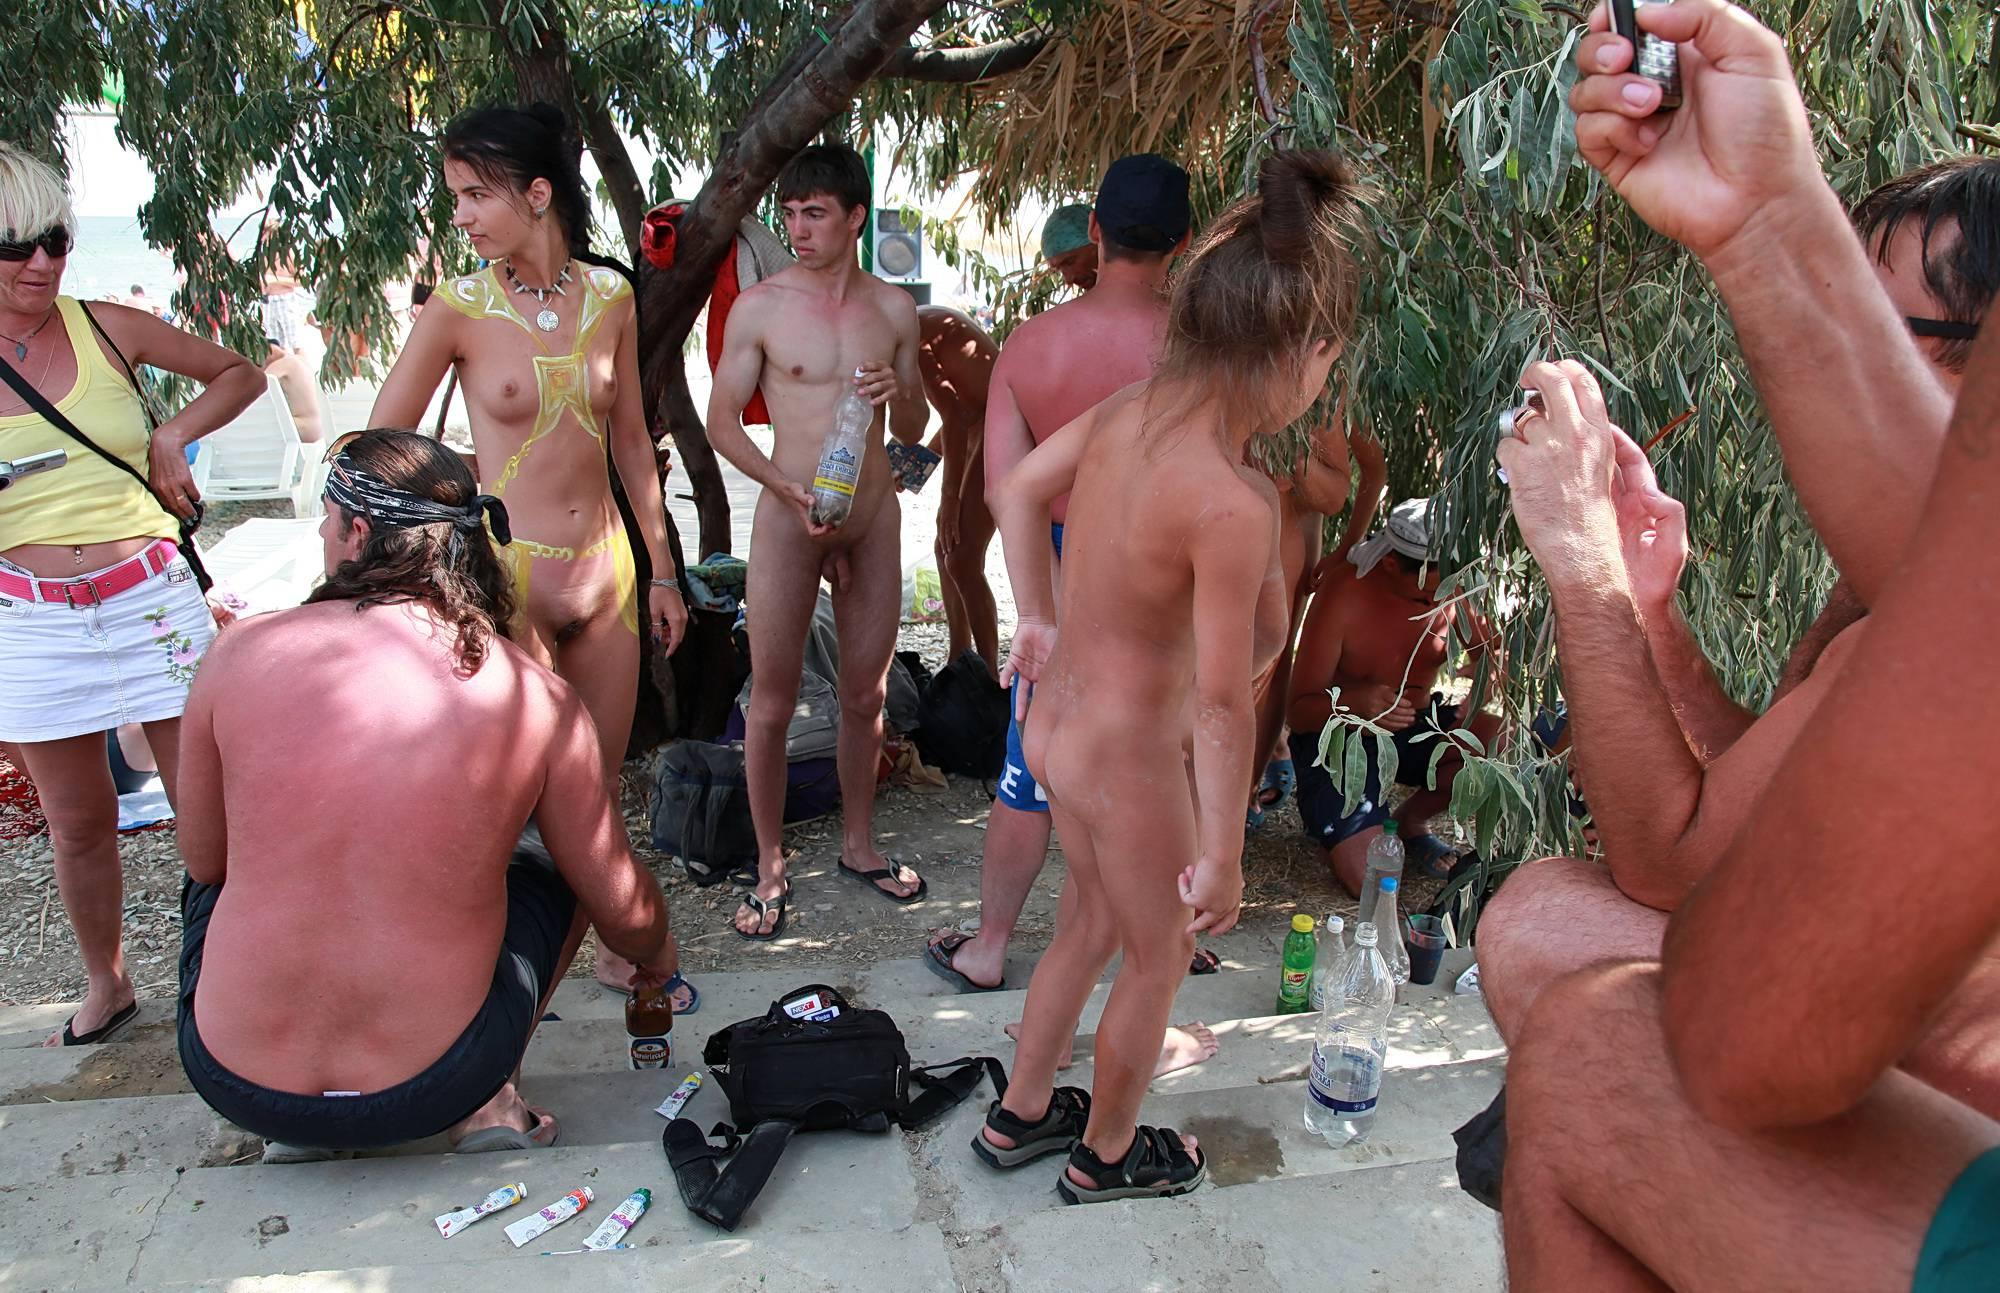 Nudist Photos The Cool Dark Shady Tree - 1